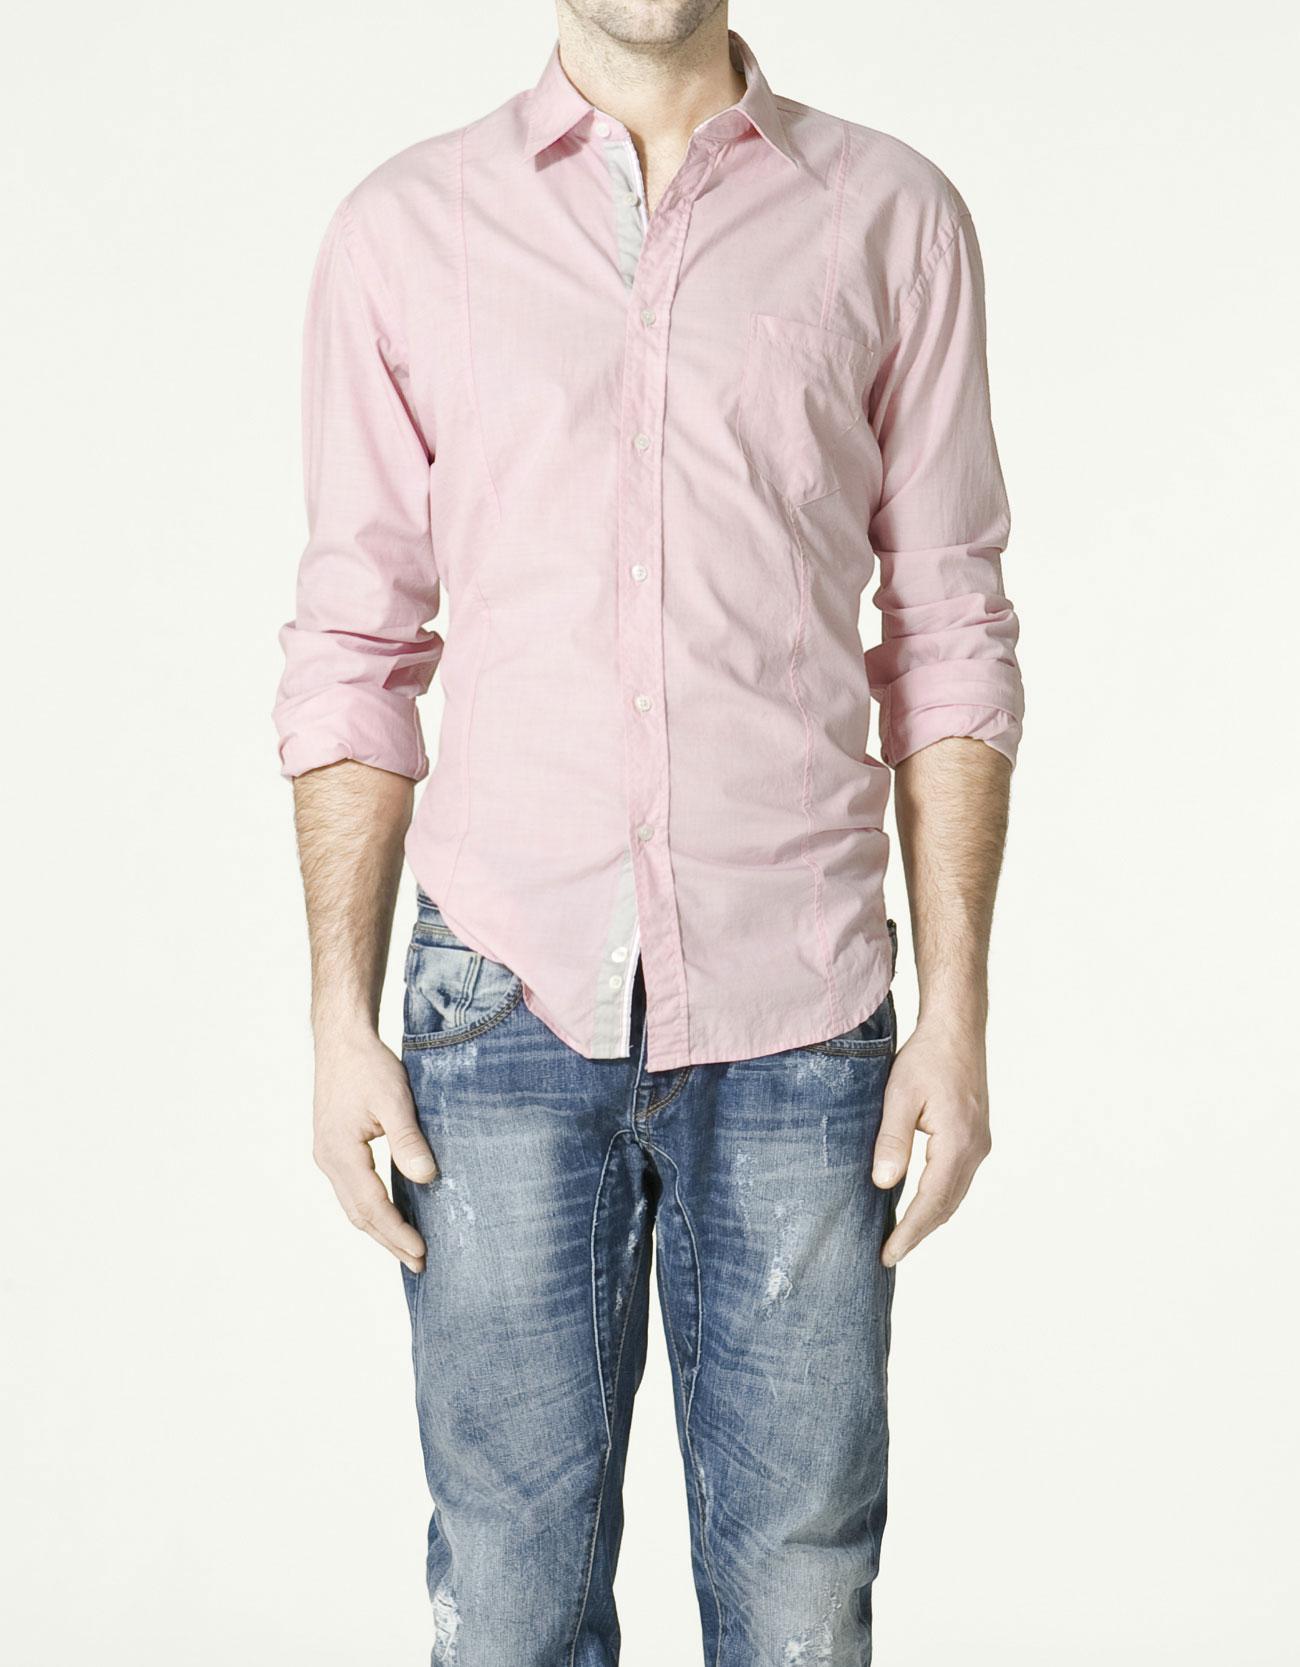 Zara fil a fil t shirt in red for men lyst for Zara mens shirts sale